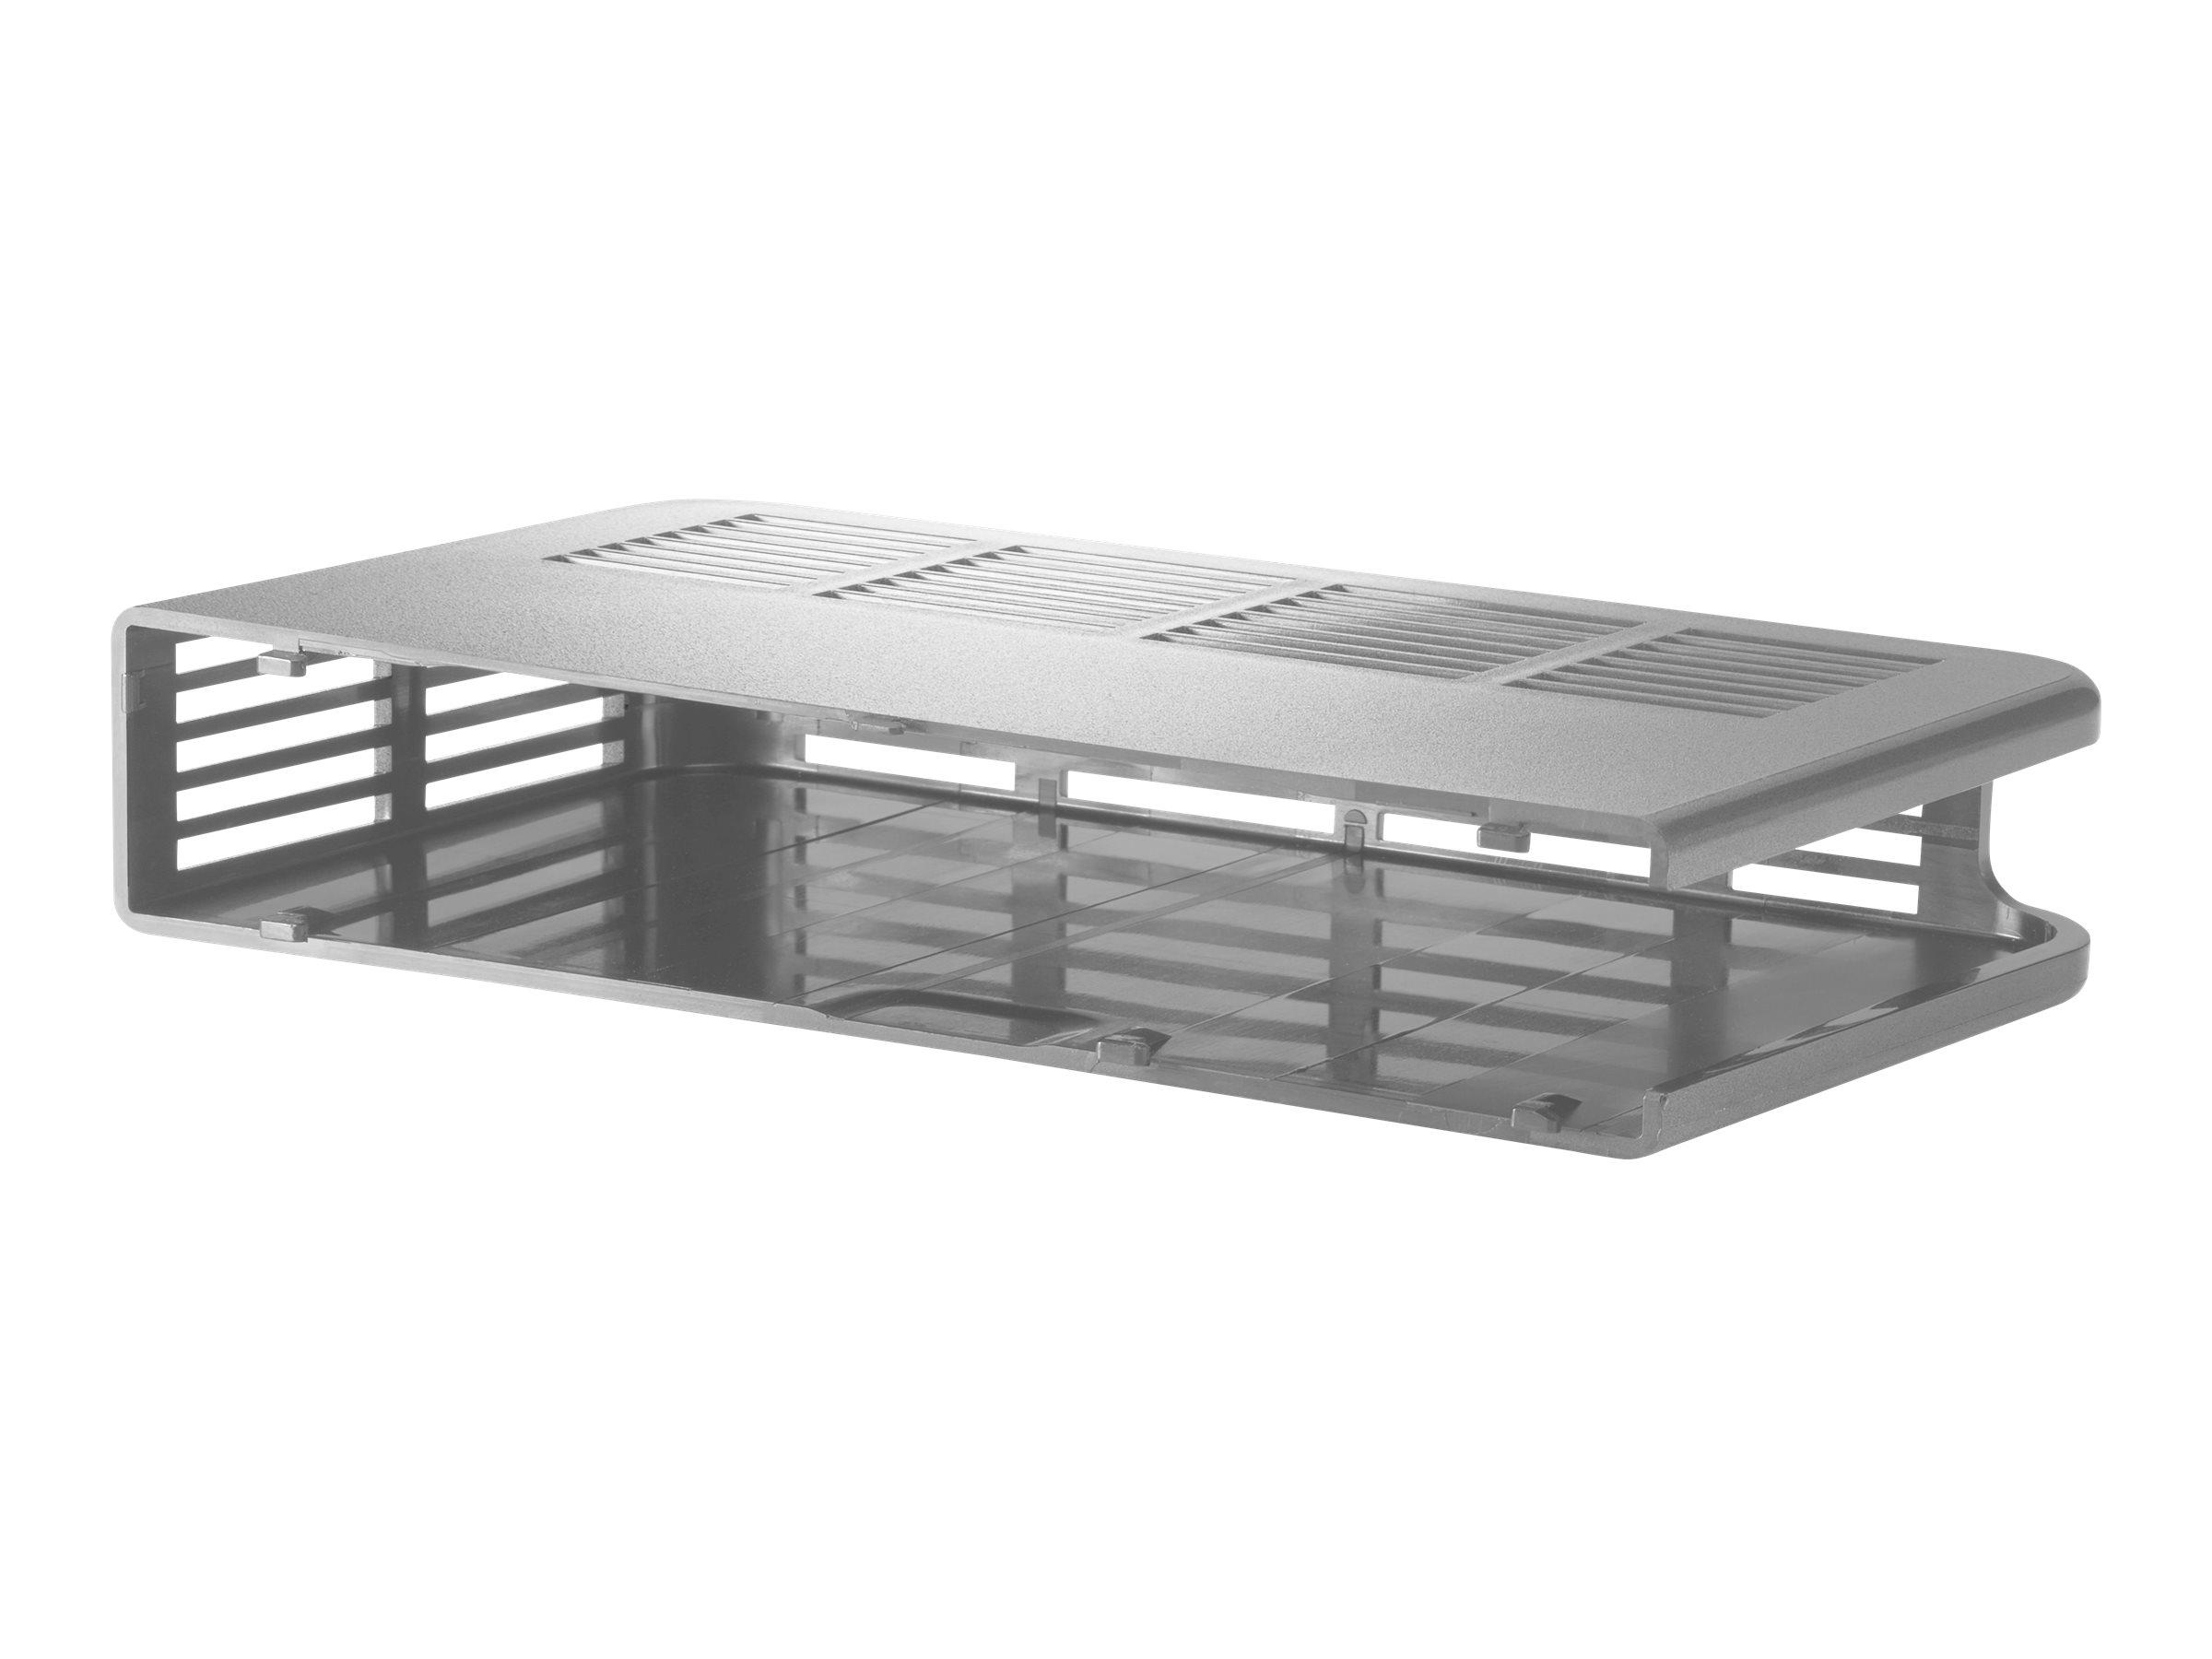 HP Desktop Mini Port Cover - Desktop-Port Abdeckung - hinten - für HP 260 G3; EliteDesk 705 G3 (Mini Desktop); ProDesk 600 G2